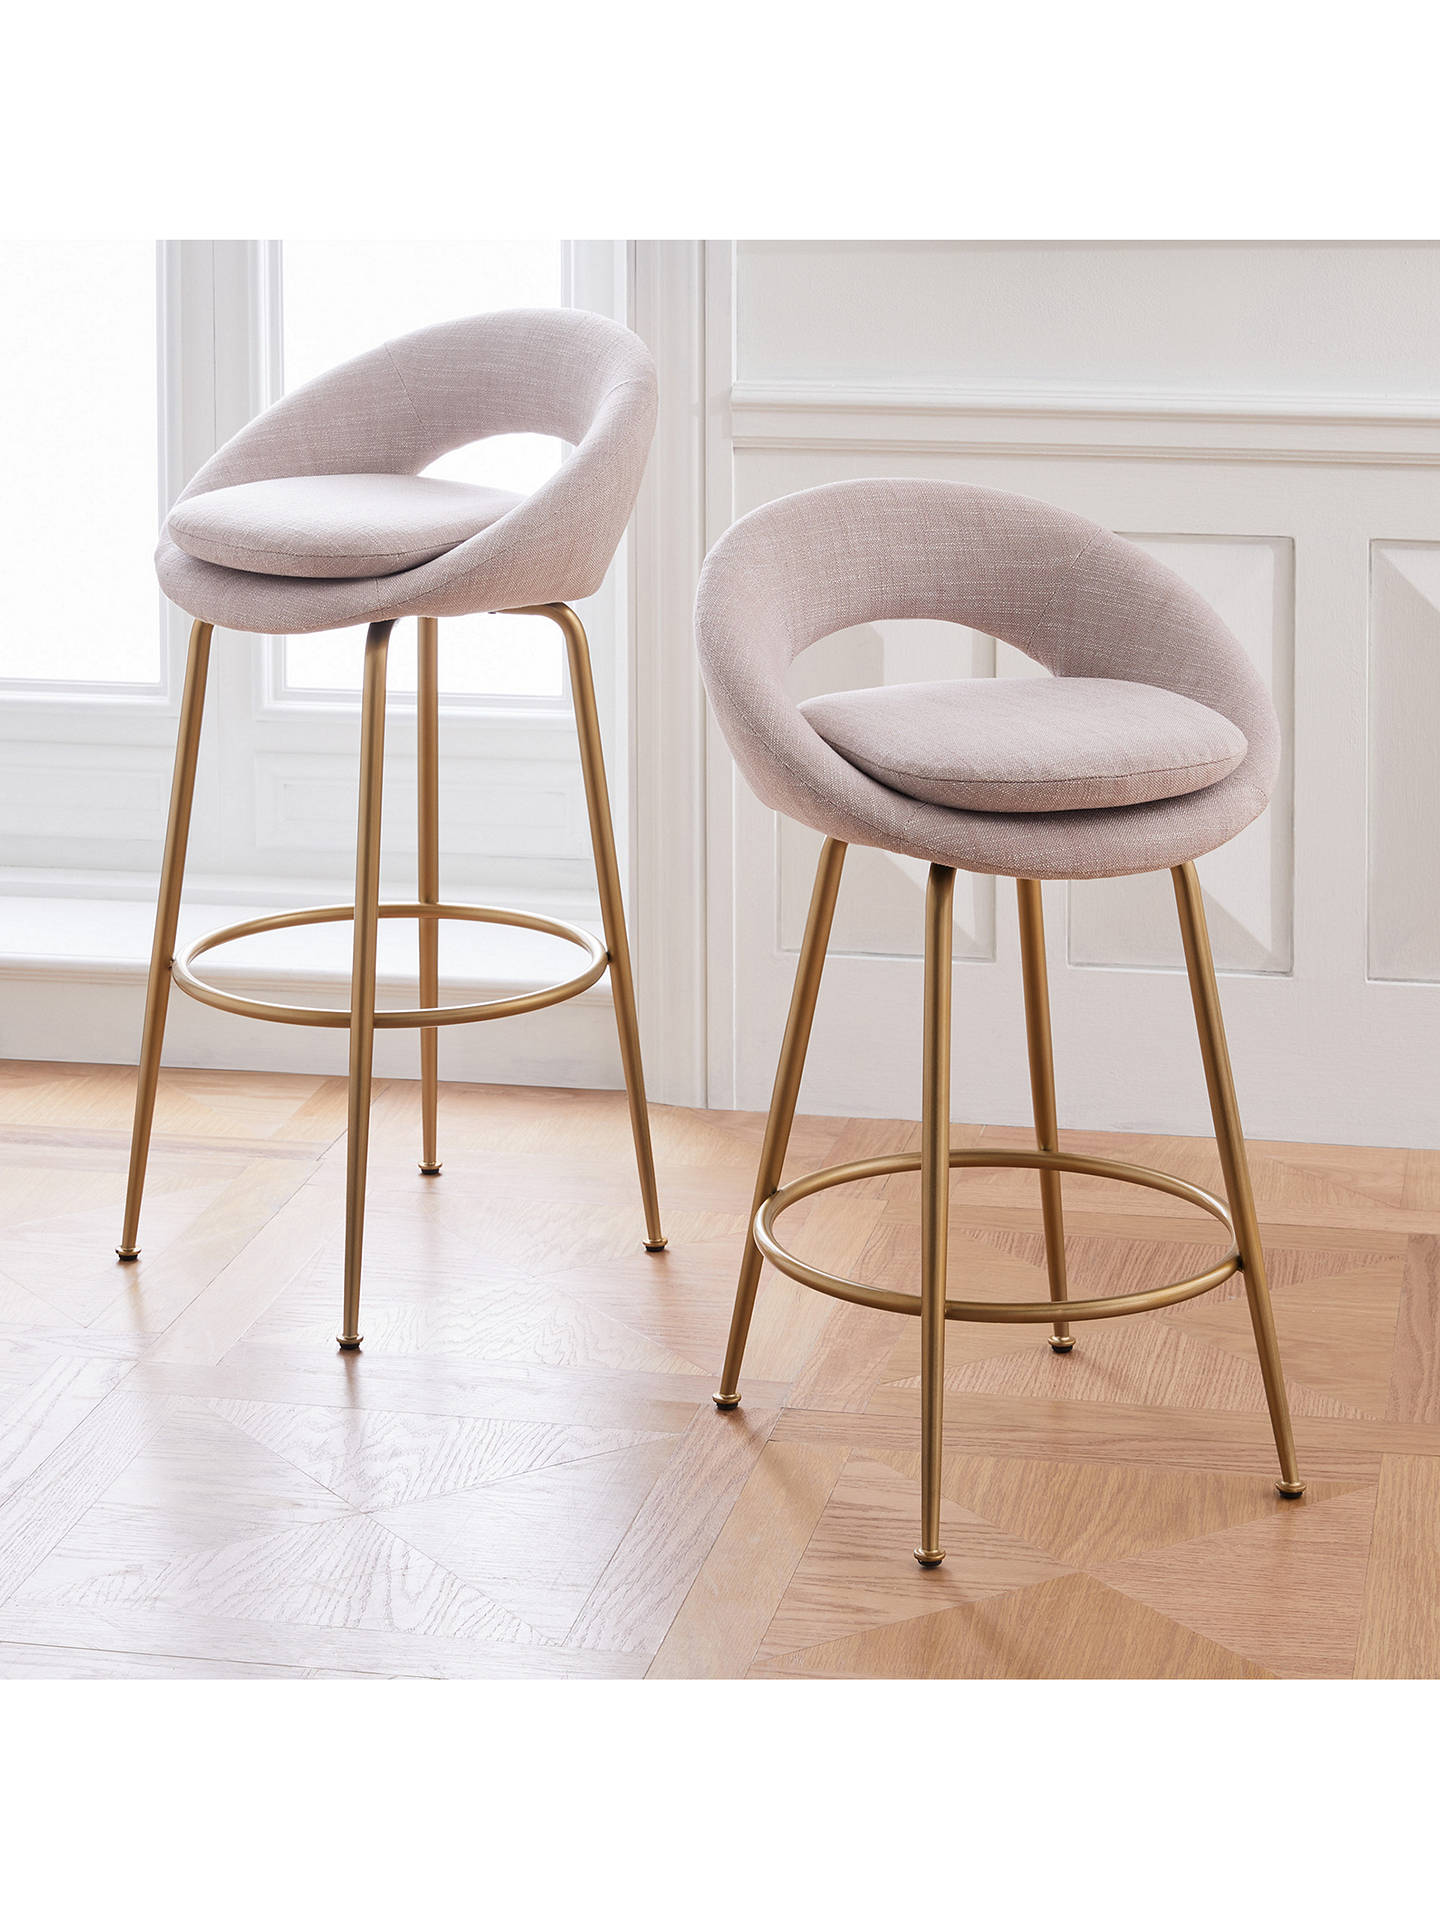 Pleasing West Elm Orb Bar Stool Blush Bralicious Painted Fabric Chair Ideas Braliciousco